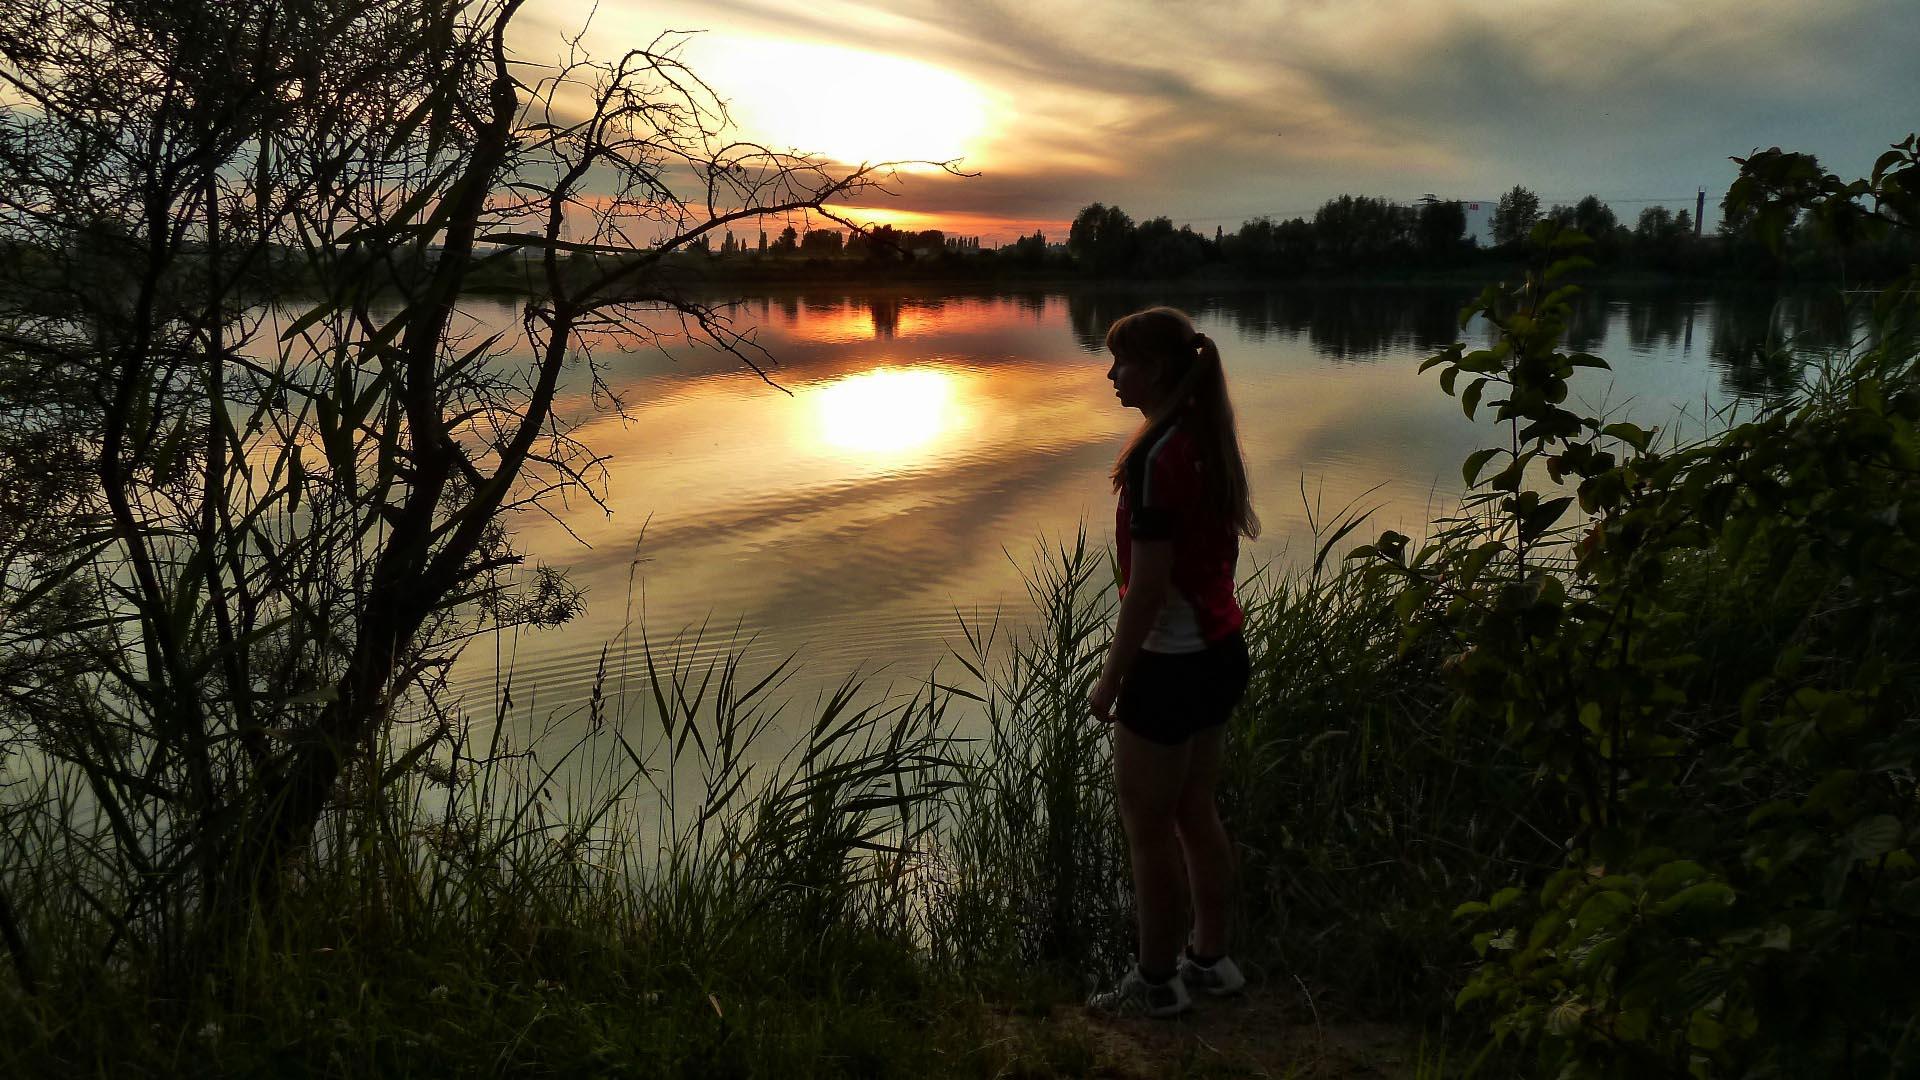 Sommerabend am Hufeisensee